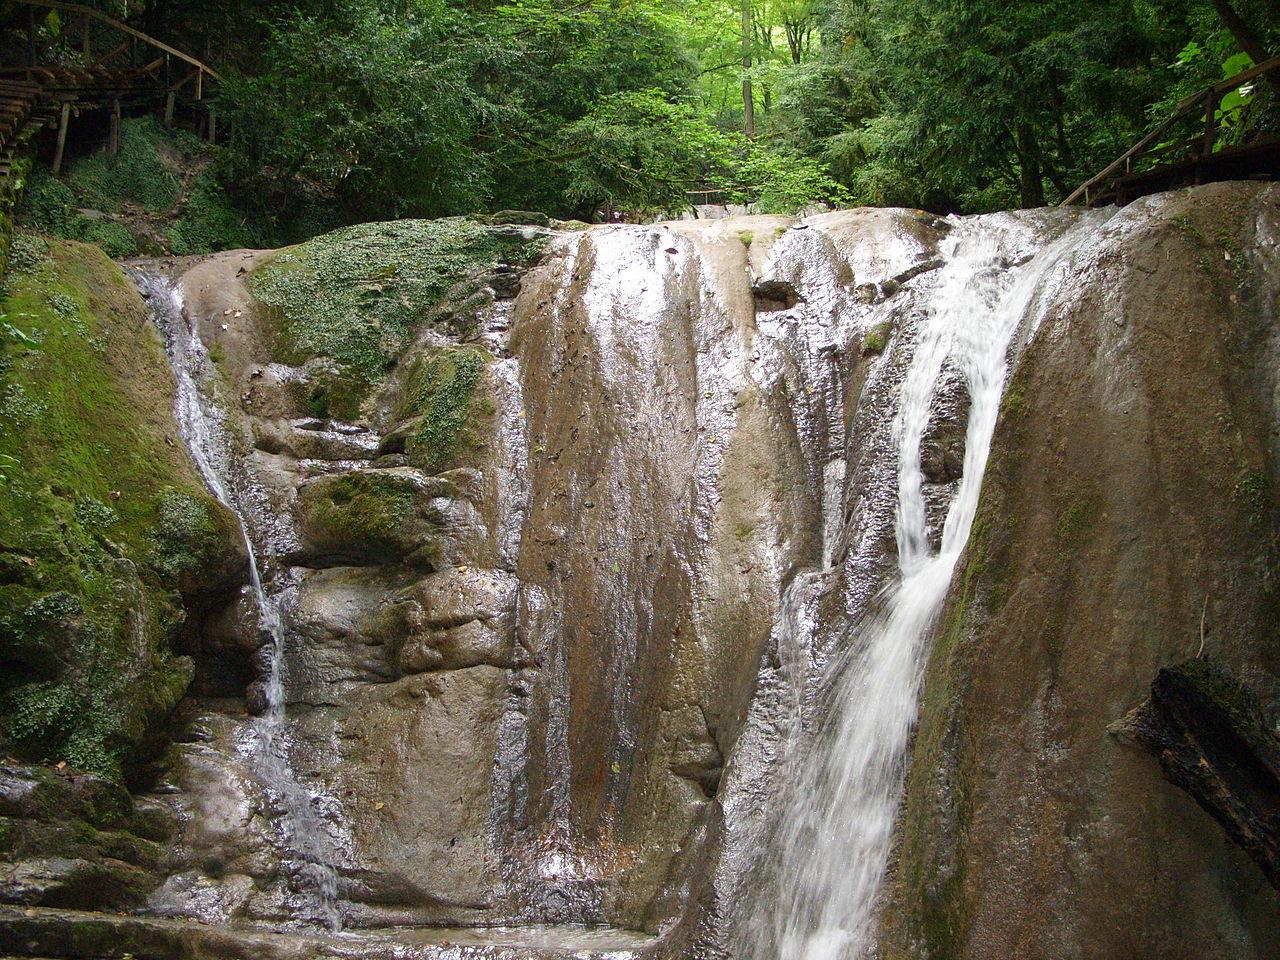 Тридцать три водопада в долине реки Шахе, Сочи